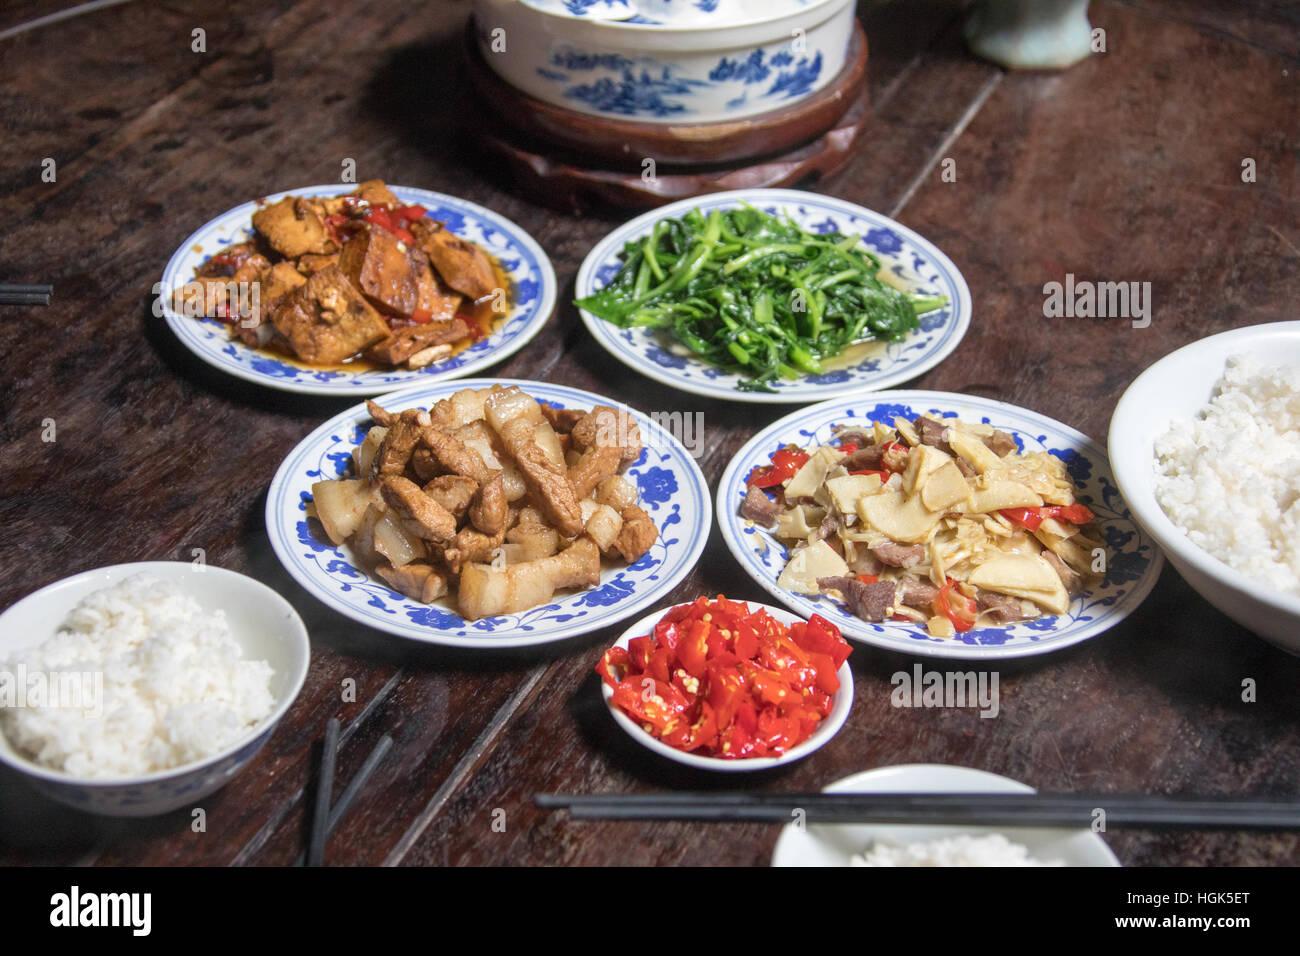 Cucina locale, Xidi, Cina Immagini Stock